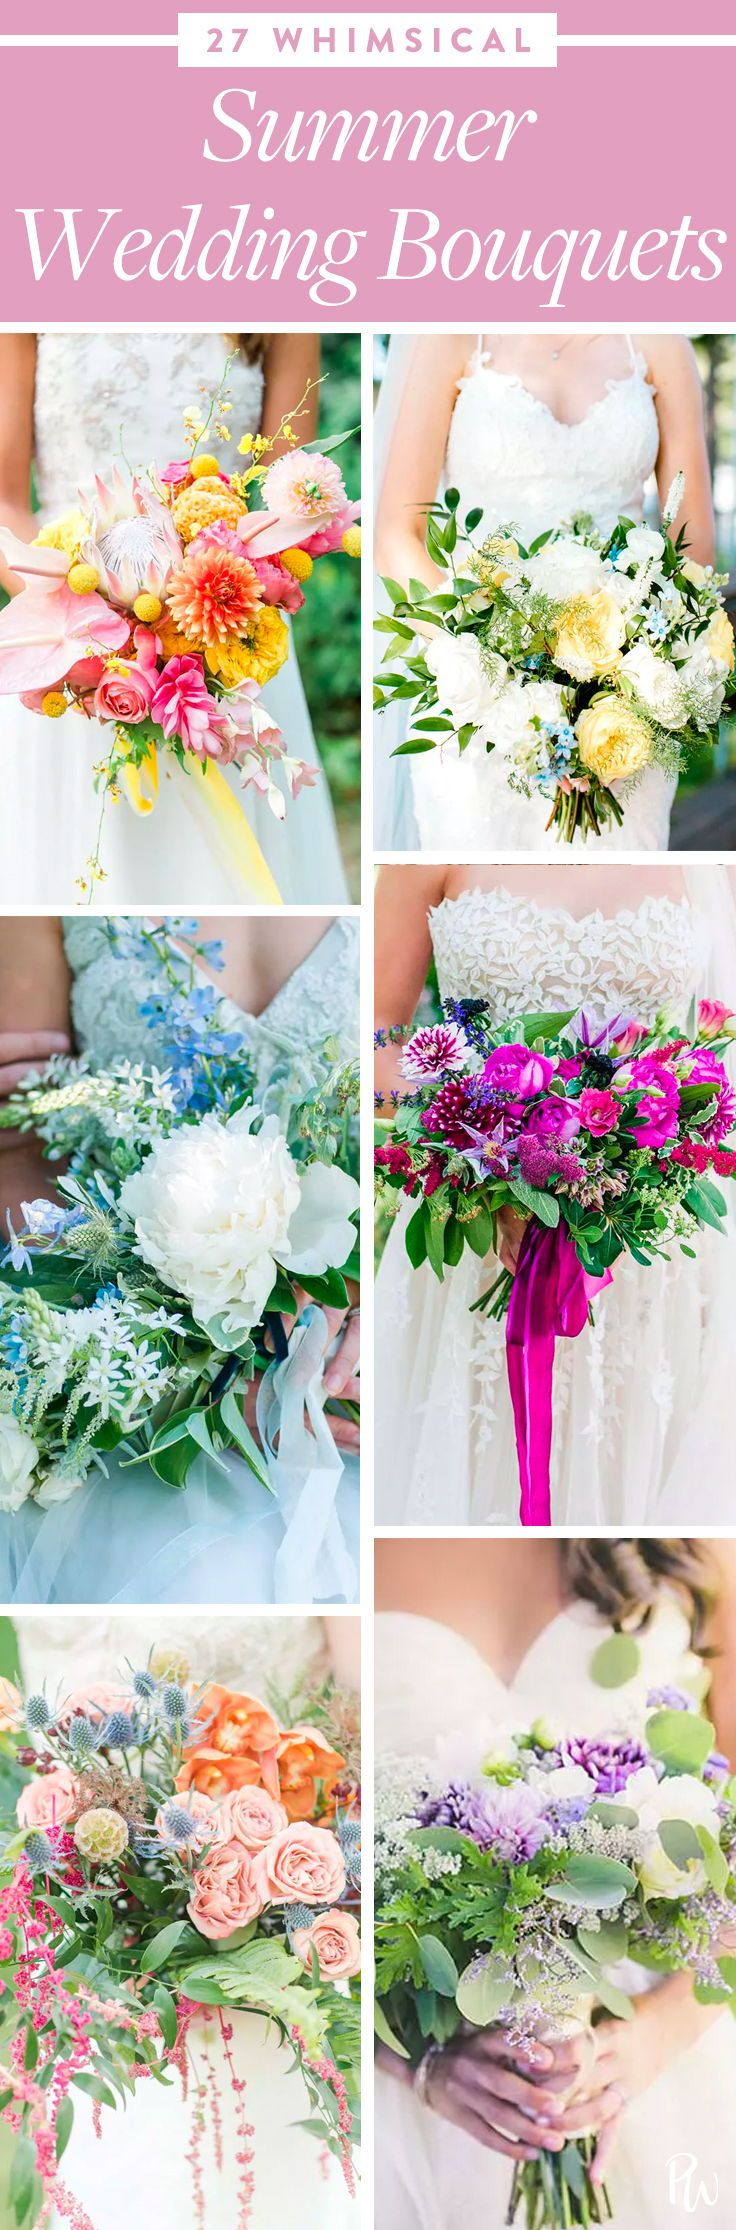 27 Whimsical Summer Wedding Bouquet Ideas Summer wedding